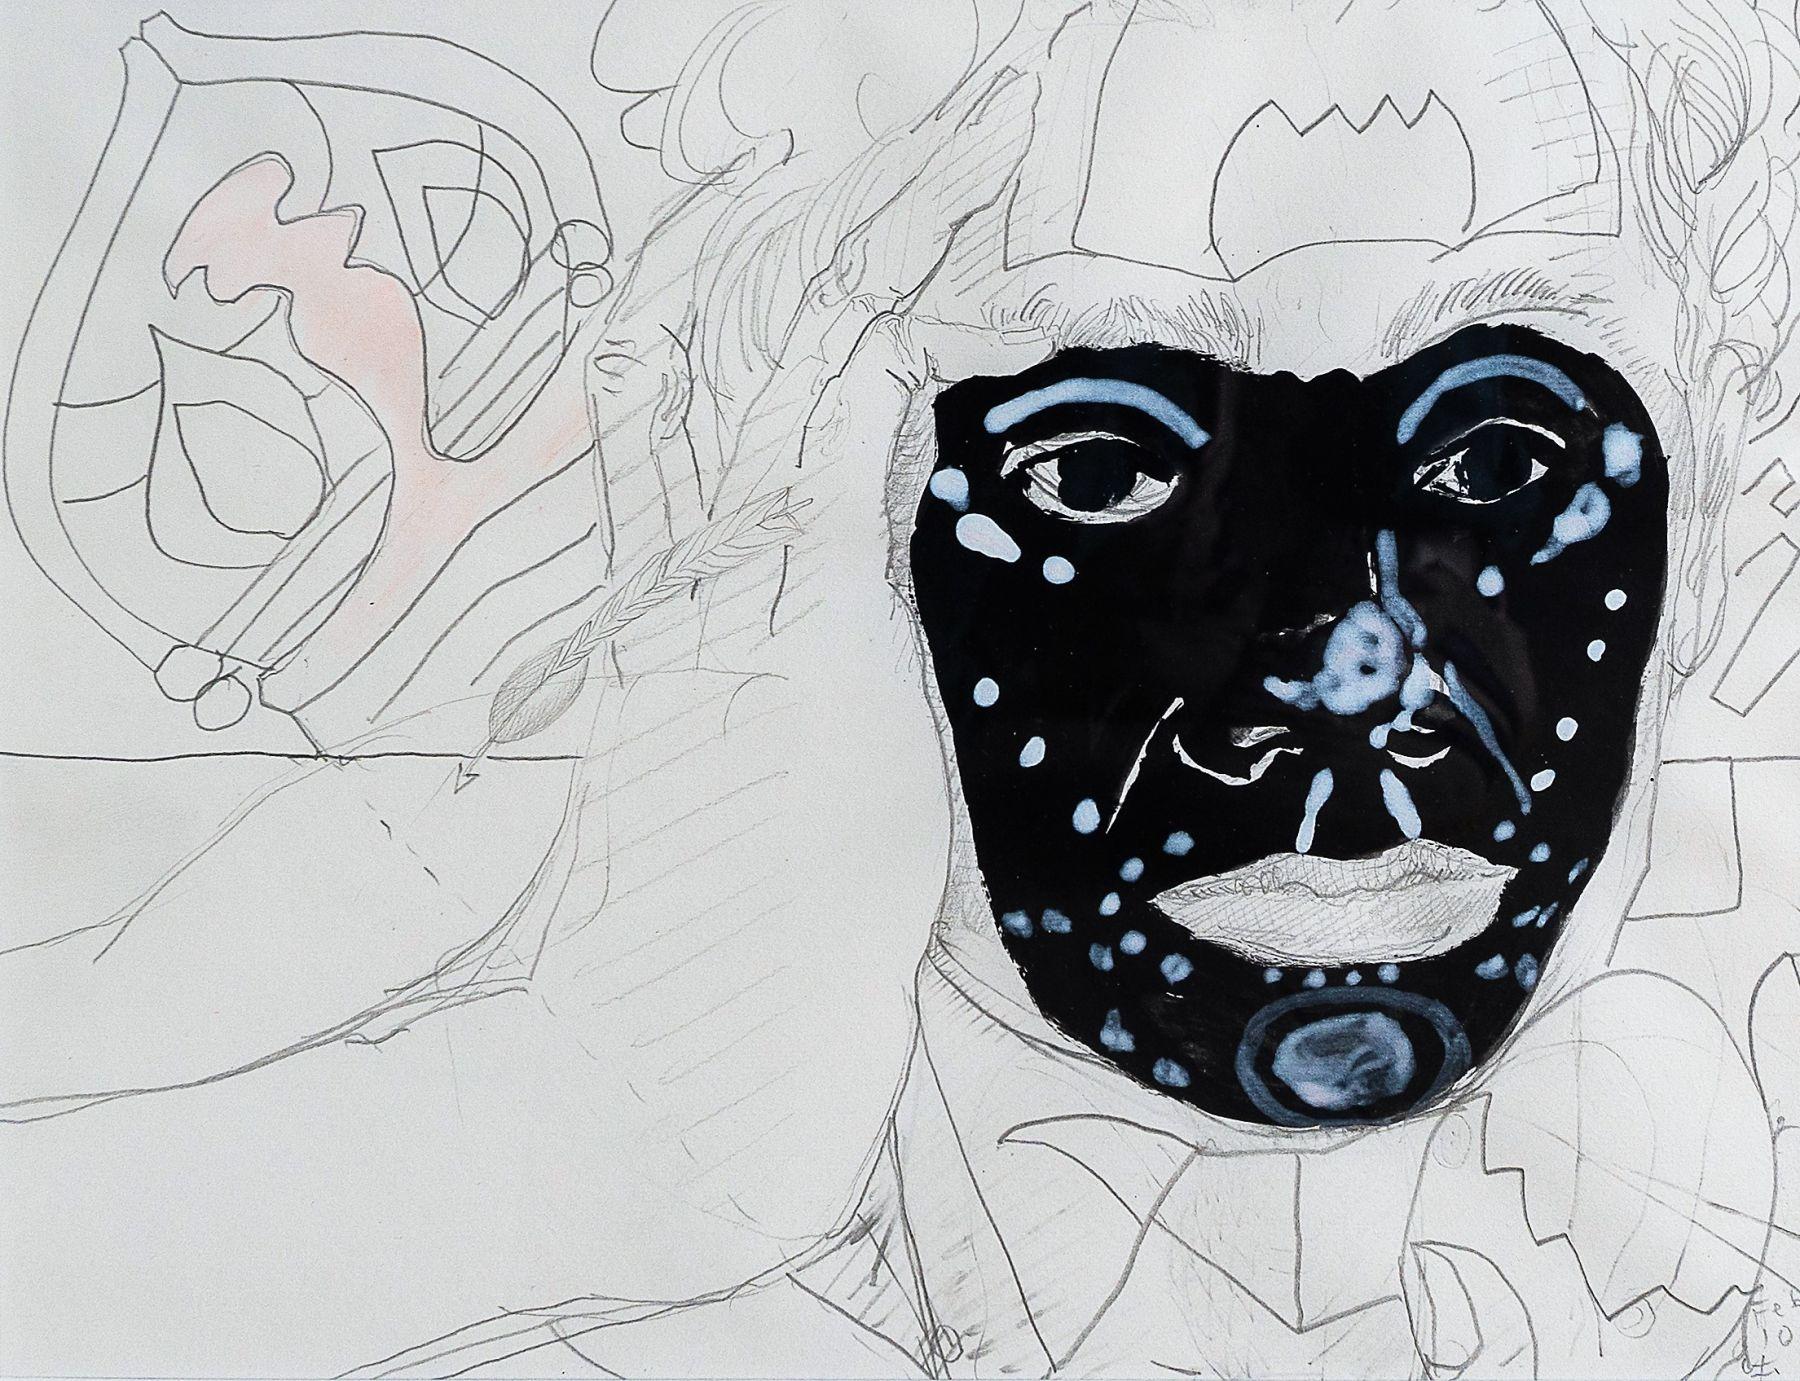 Intercesora from Visto, no vista by Carlos Franco at Hg Contemporary